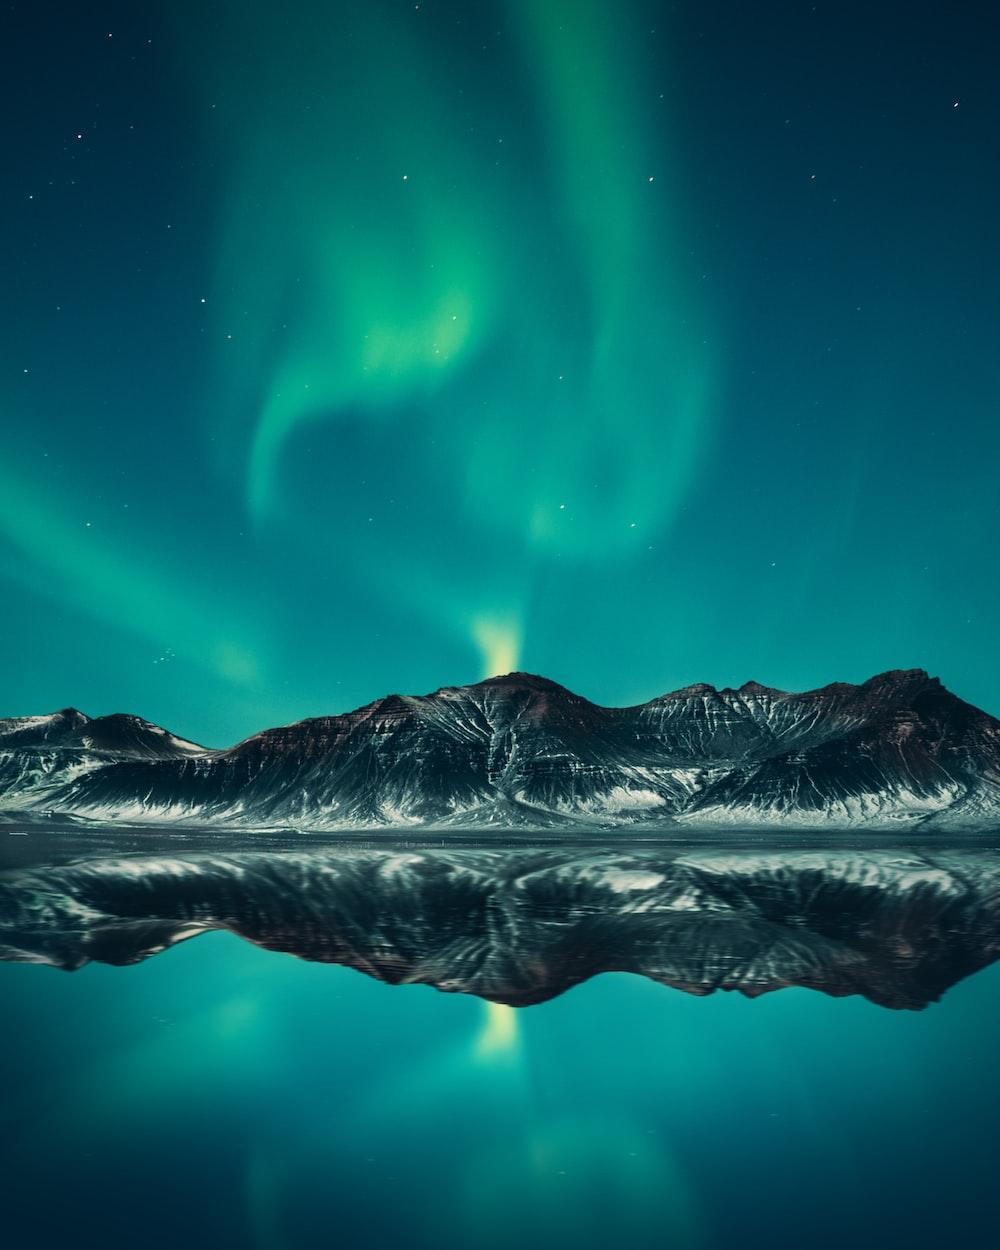 Best 500 Northern Lights Wallpapers Download Free Images On Unsplash